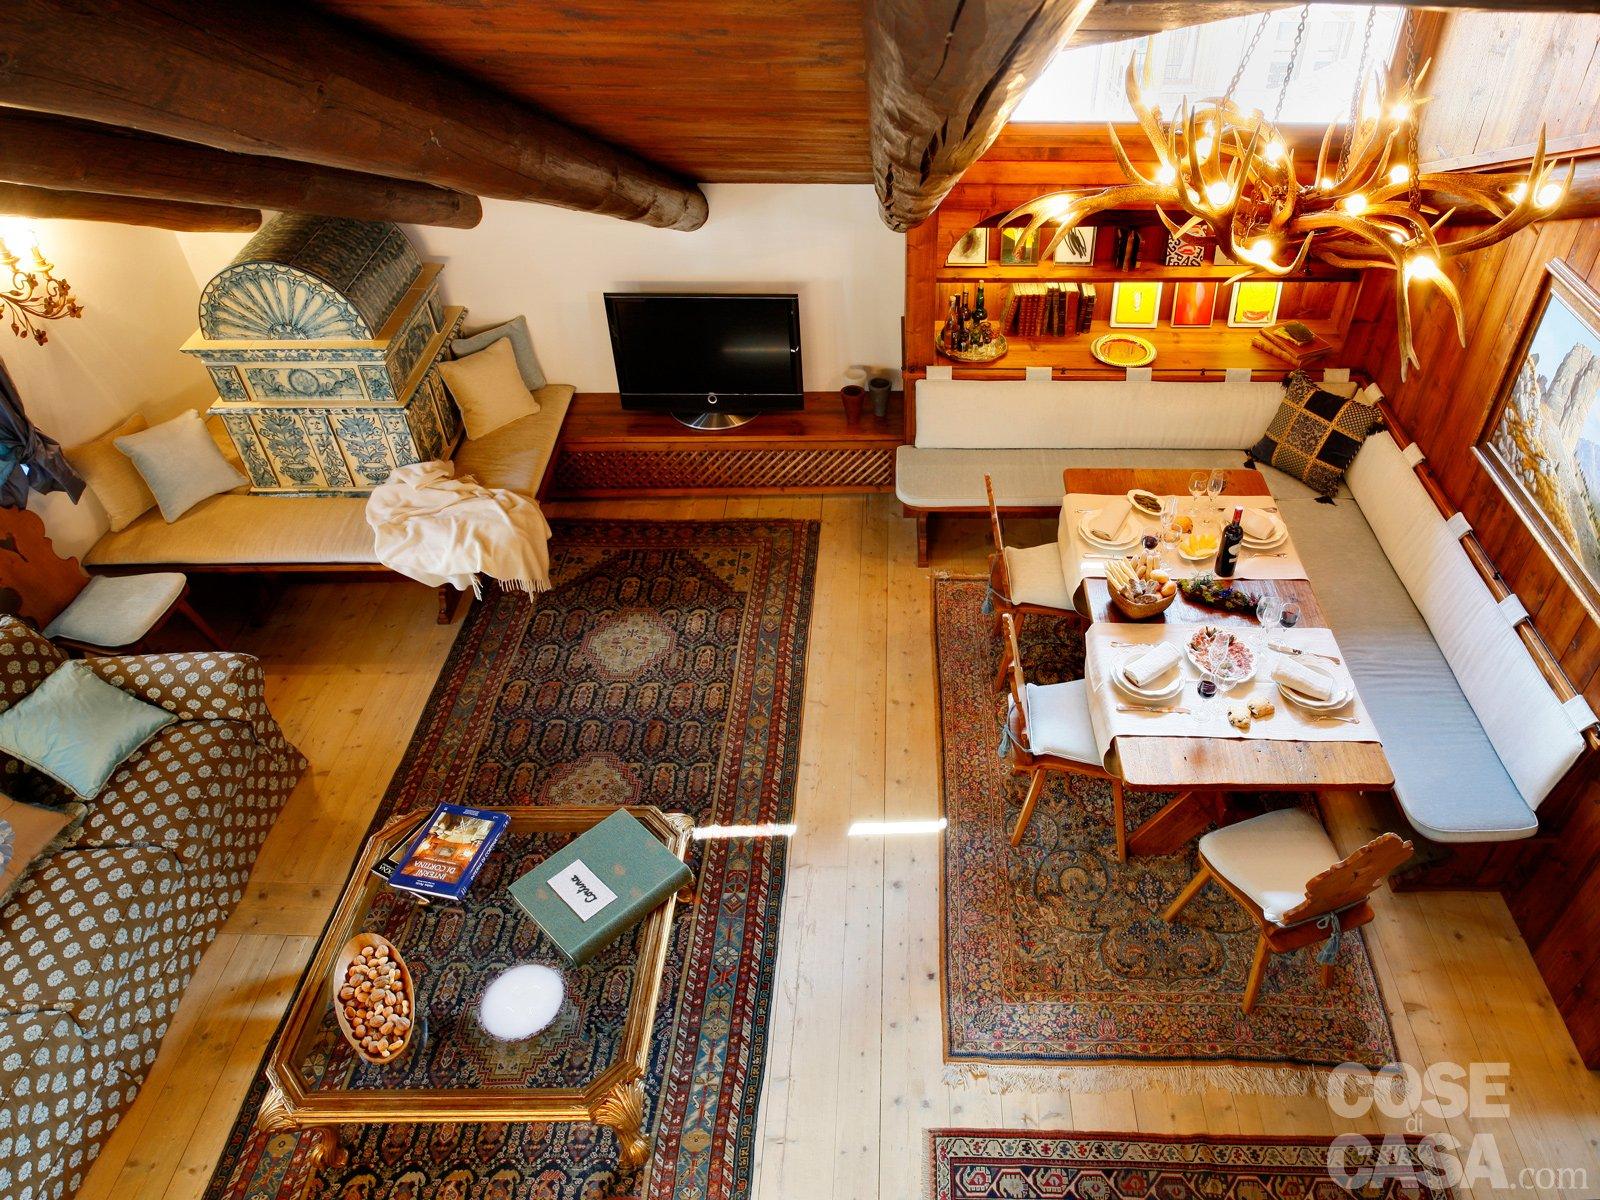 Case Di Montagna A Natale : Casa di legno su un pendio di montagna neve natale blu hhory di